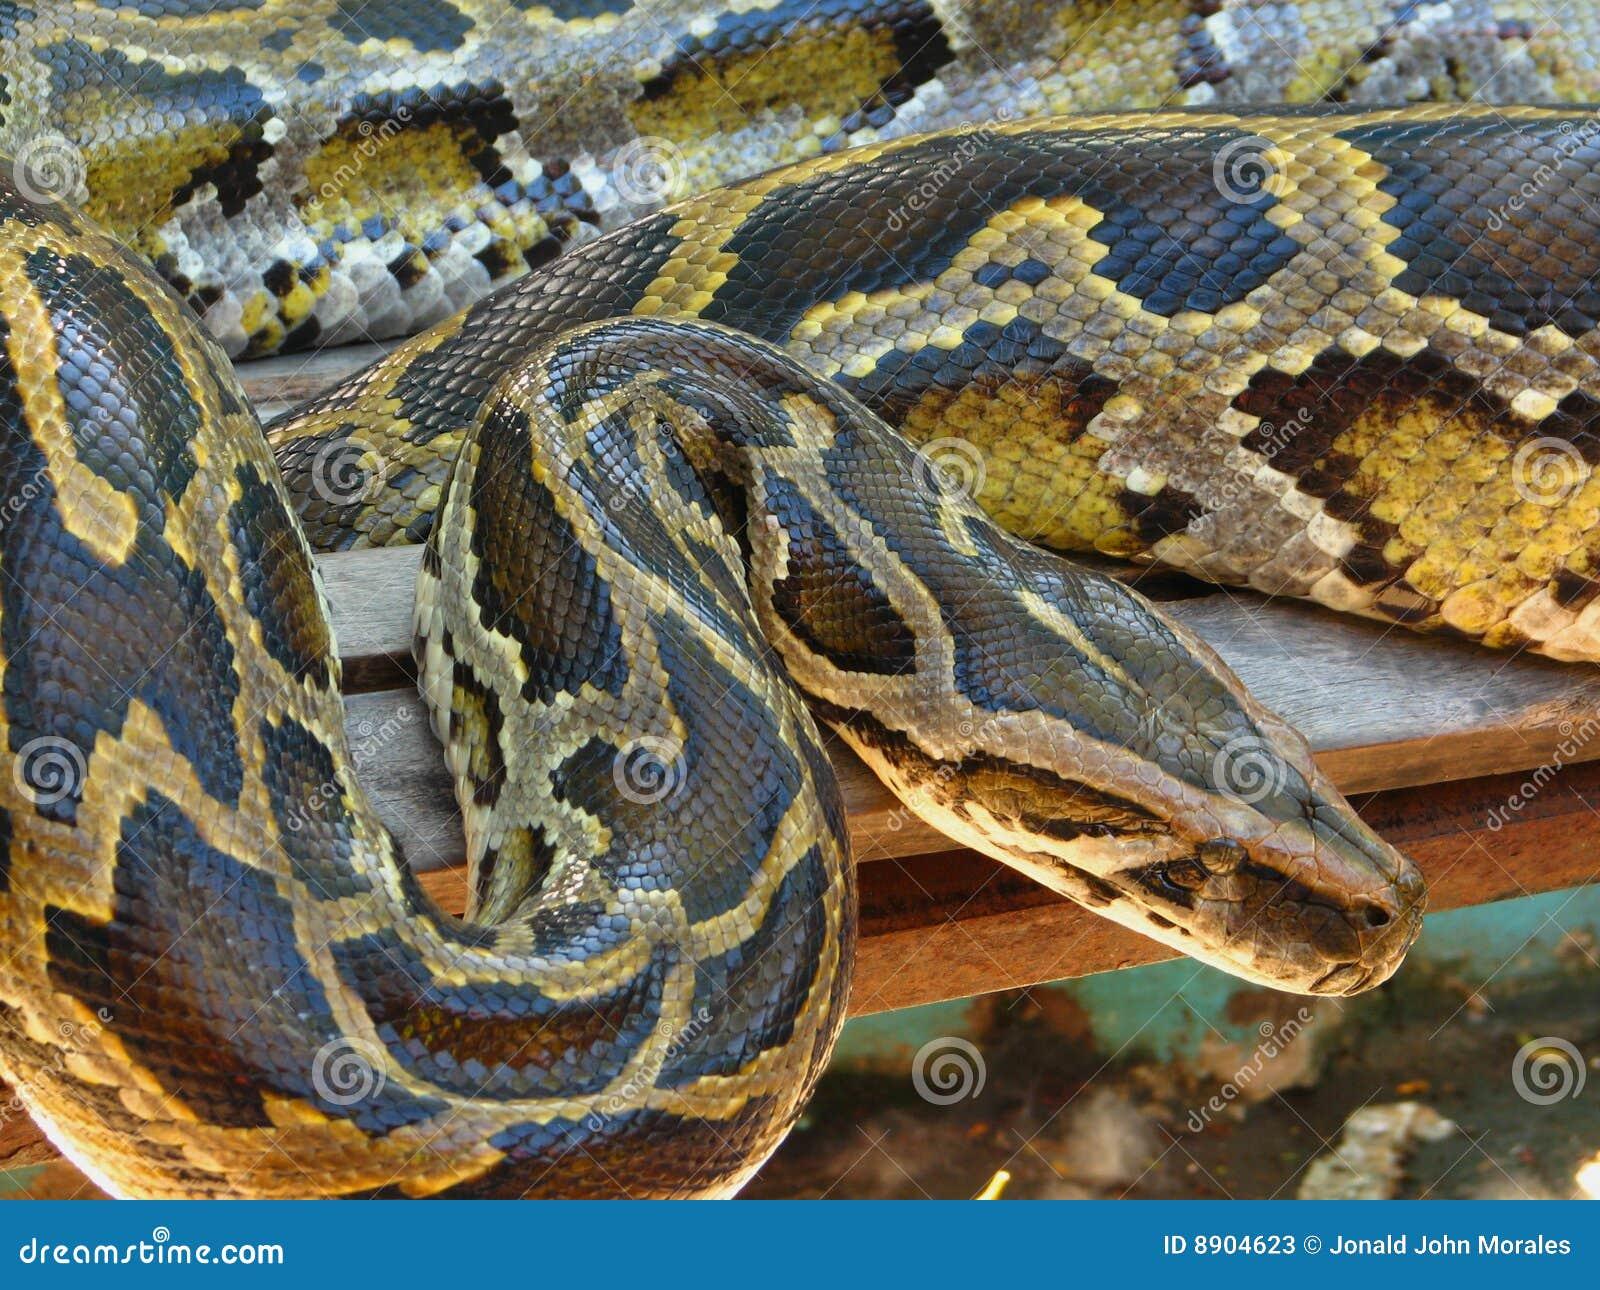 Pythonschlange-Boa constrictor